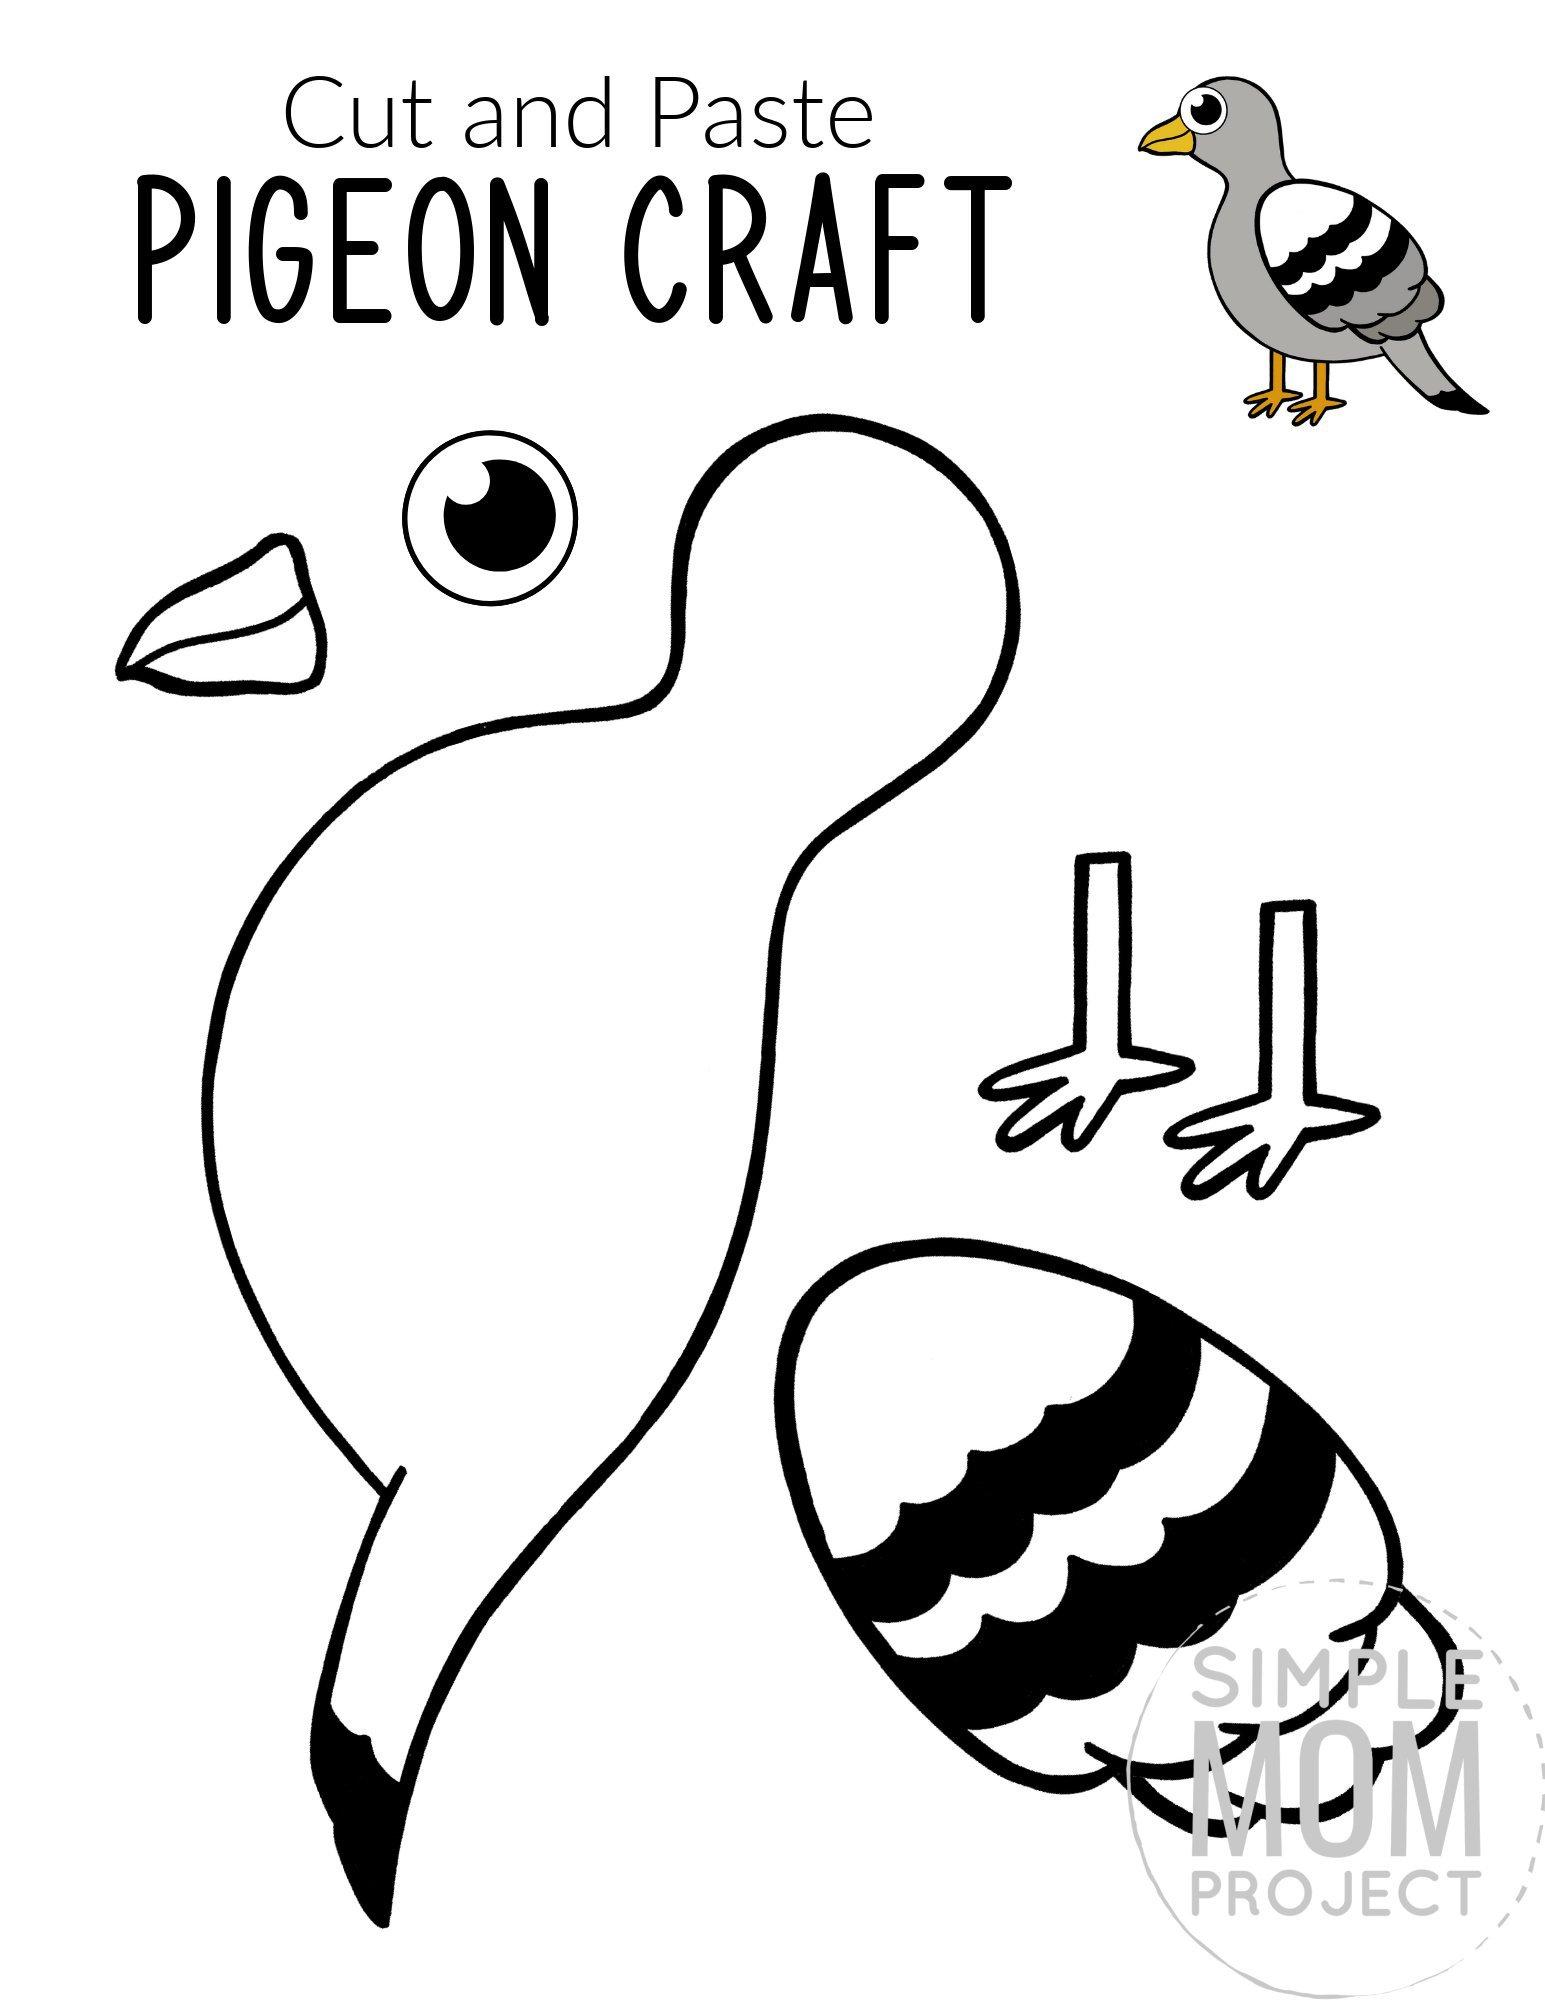 Printable Pigeon Craft for Kids, preschoolers toddlers and kindergartners